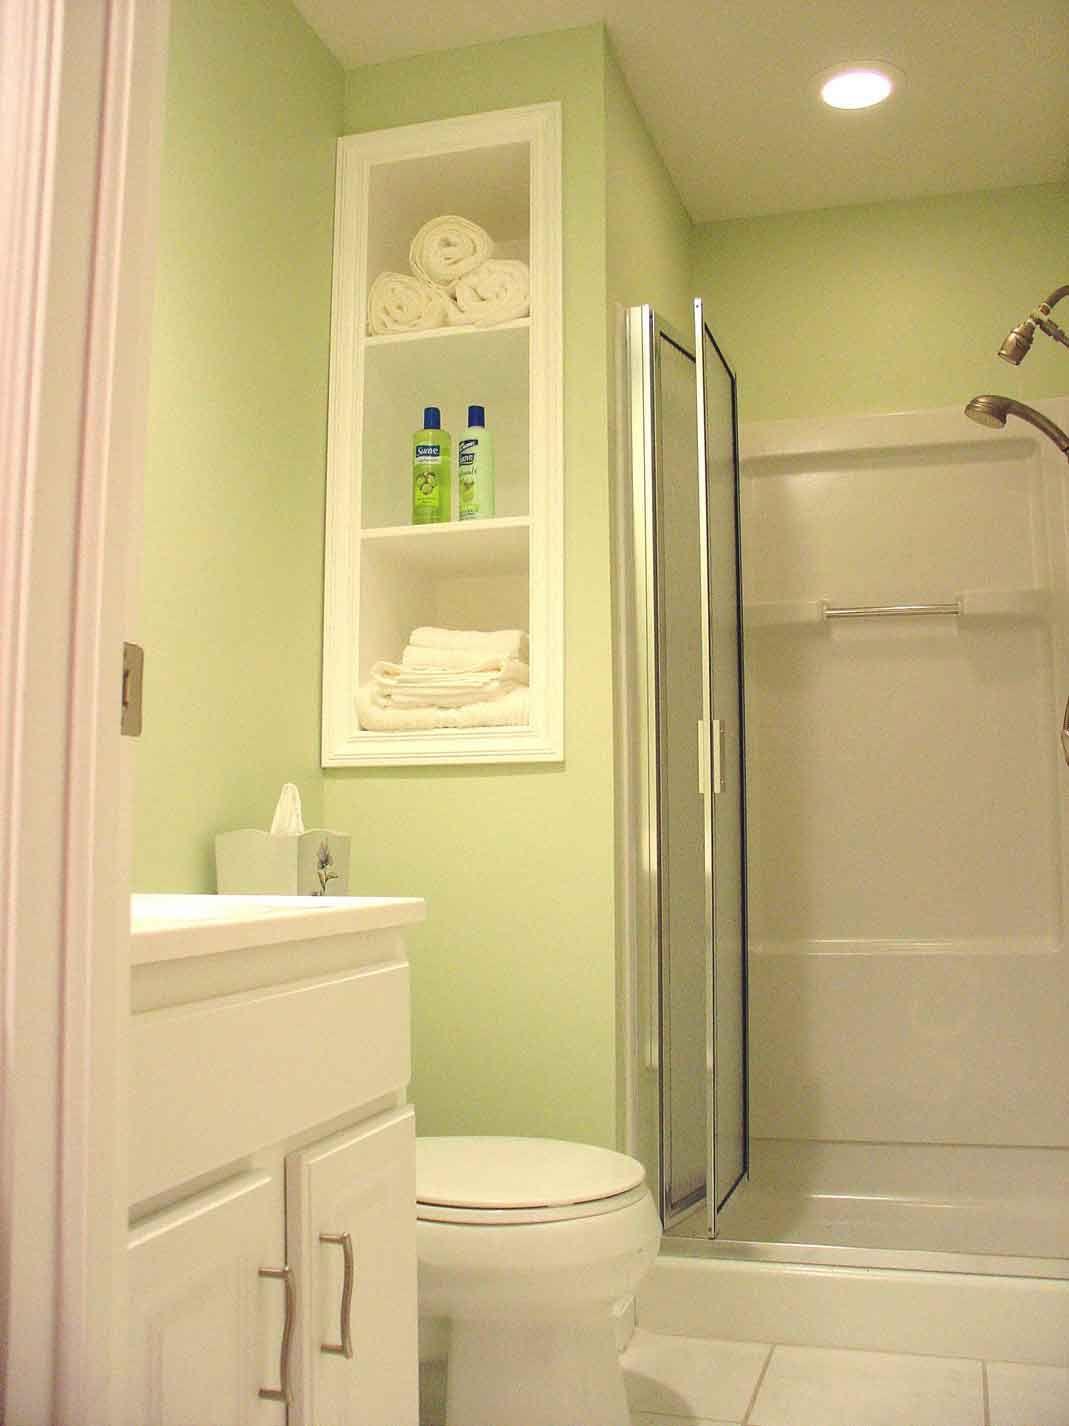 interior design shelves - 1000+ images about bathroom ideas on Pinterest Beach bathrooms ...